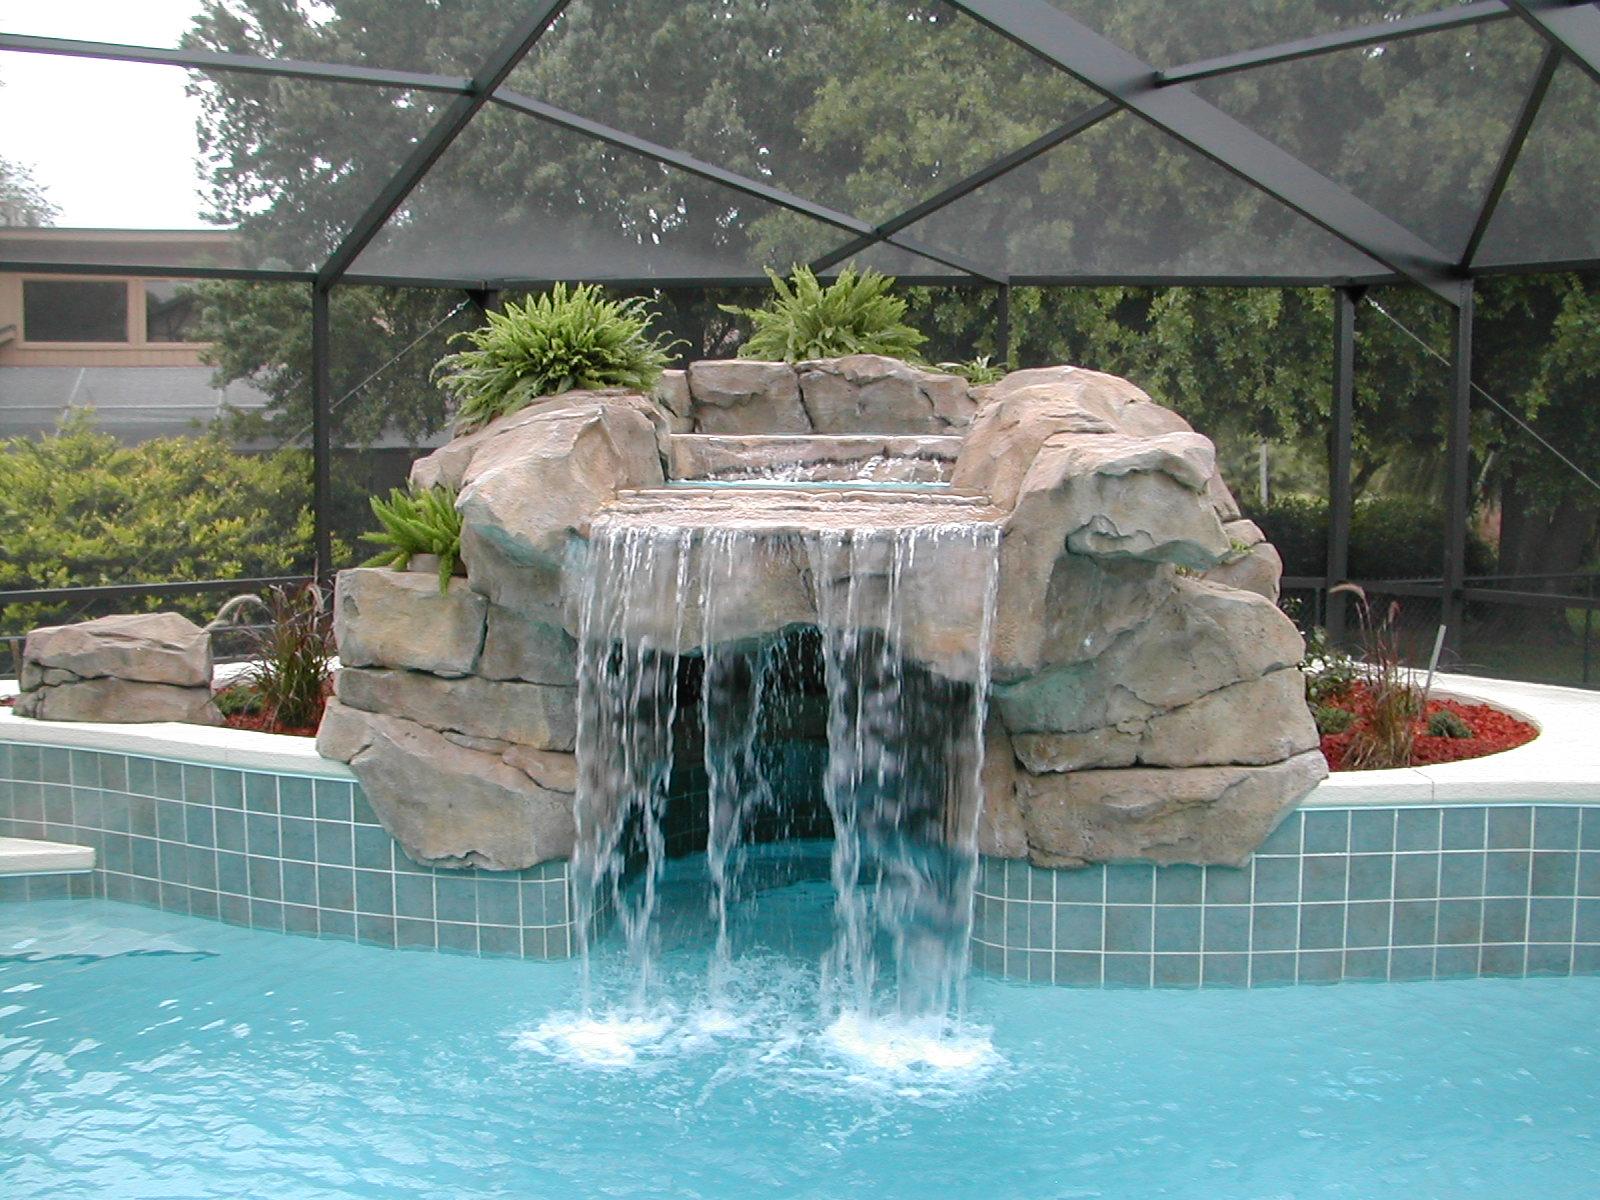 Water Features | Omni Pool Builders & Design